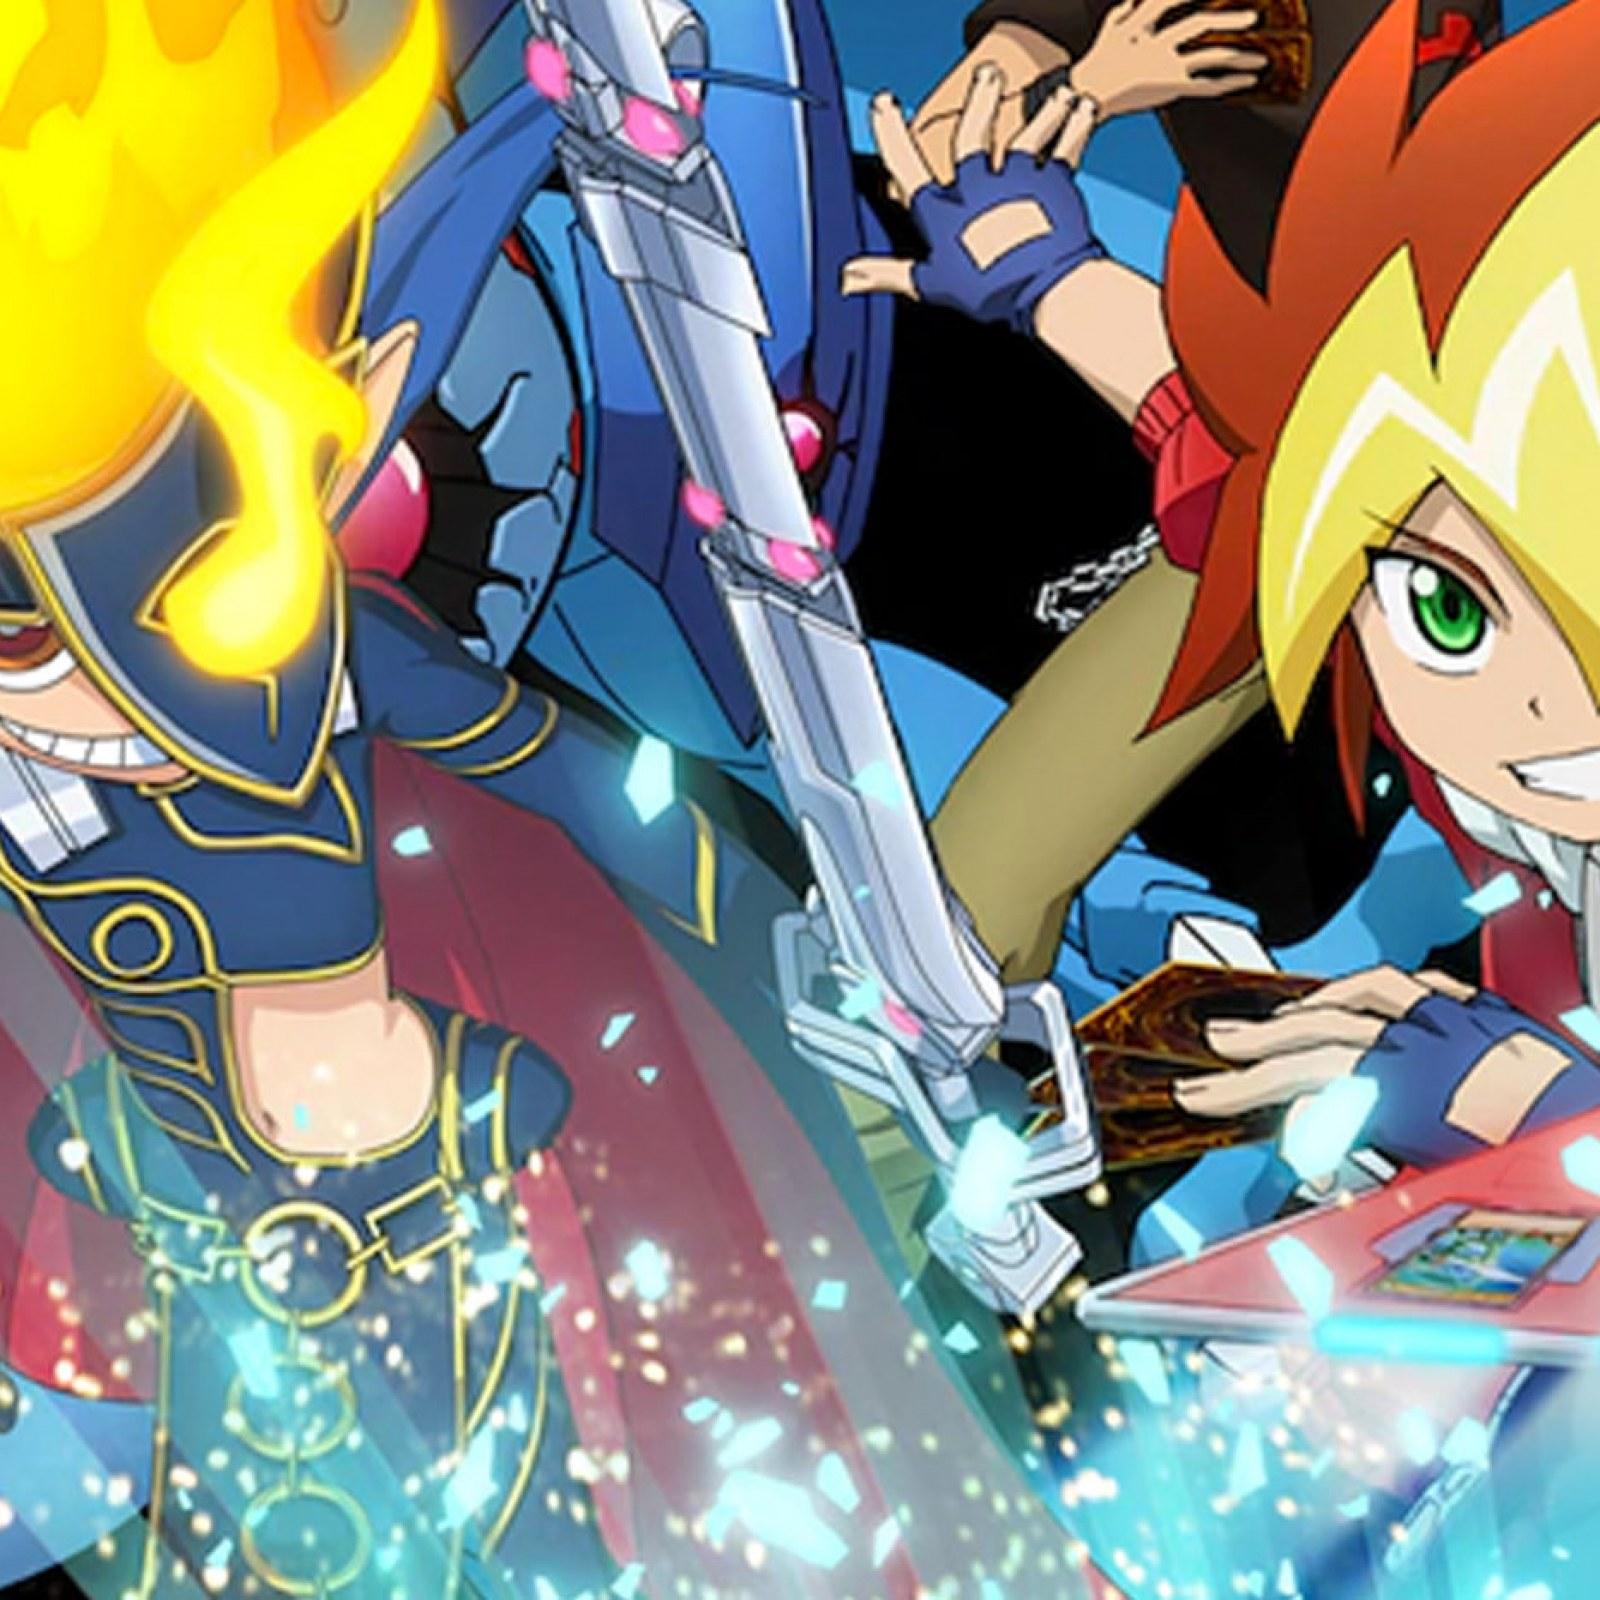 New Yu Gi Oh Sevens Anime Announced Tcg Master Rule 5 Explained